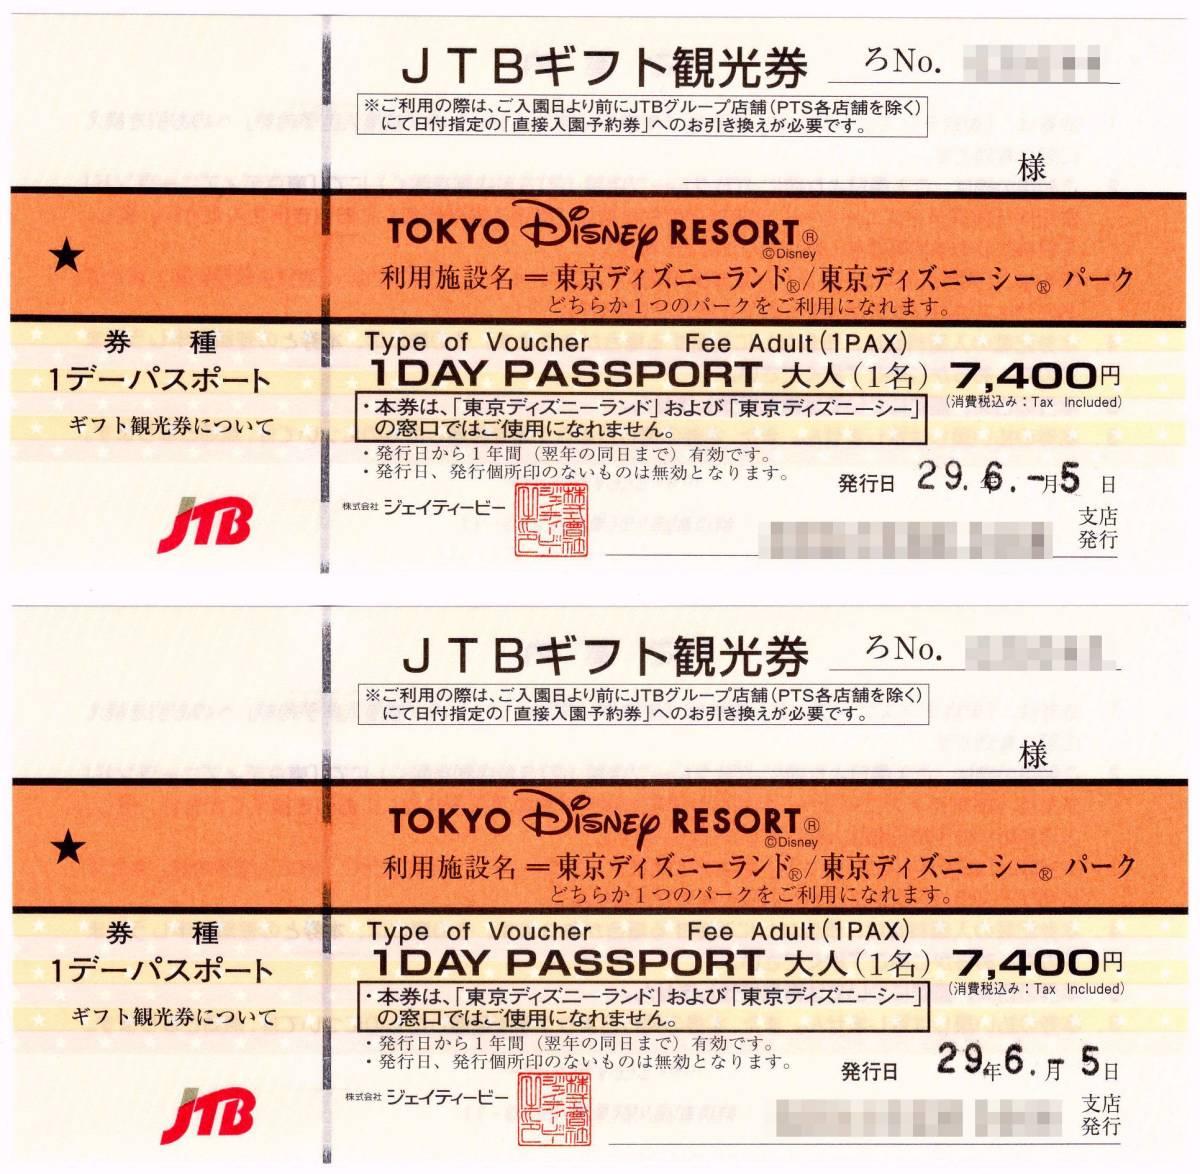 jtb 東京ディズニーリゾートの値段と価格推移は?|25件の売買情報を集計